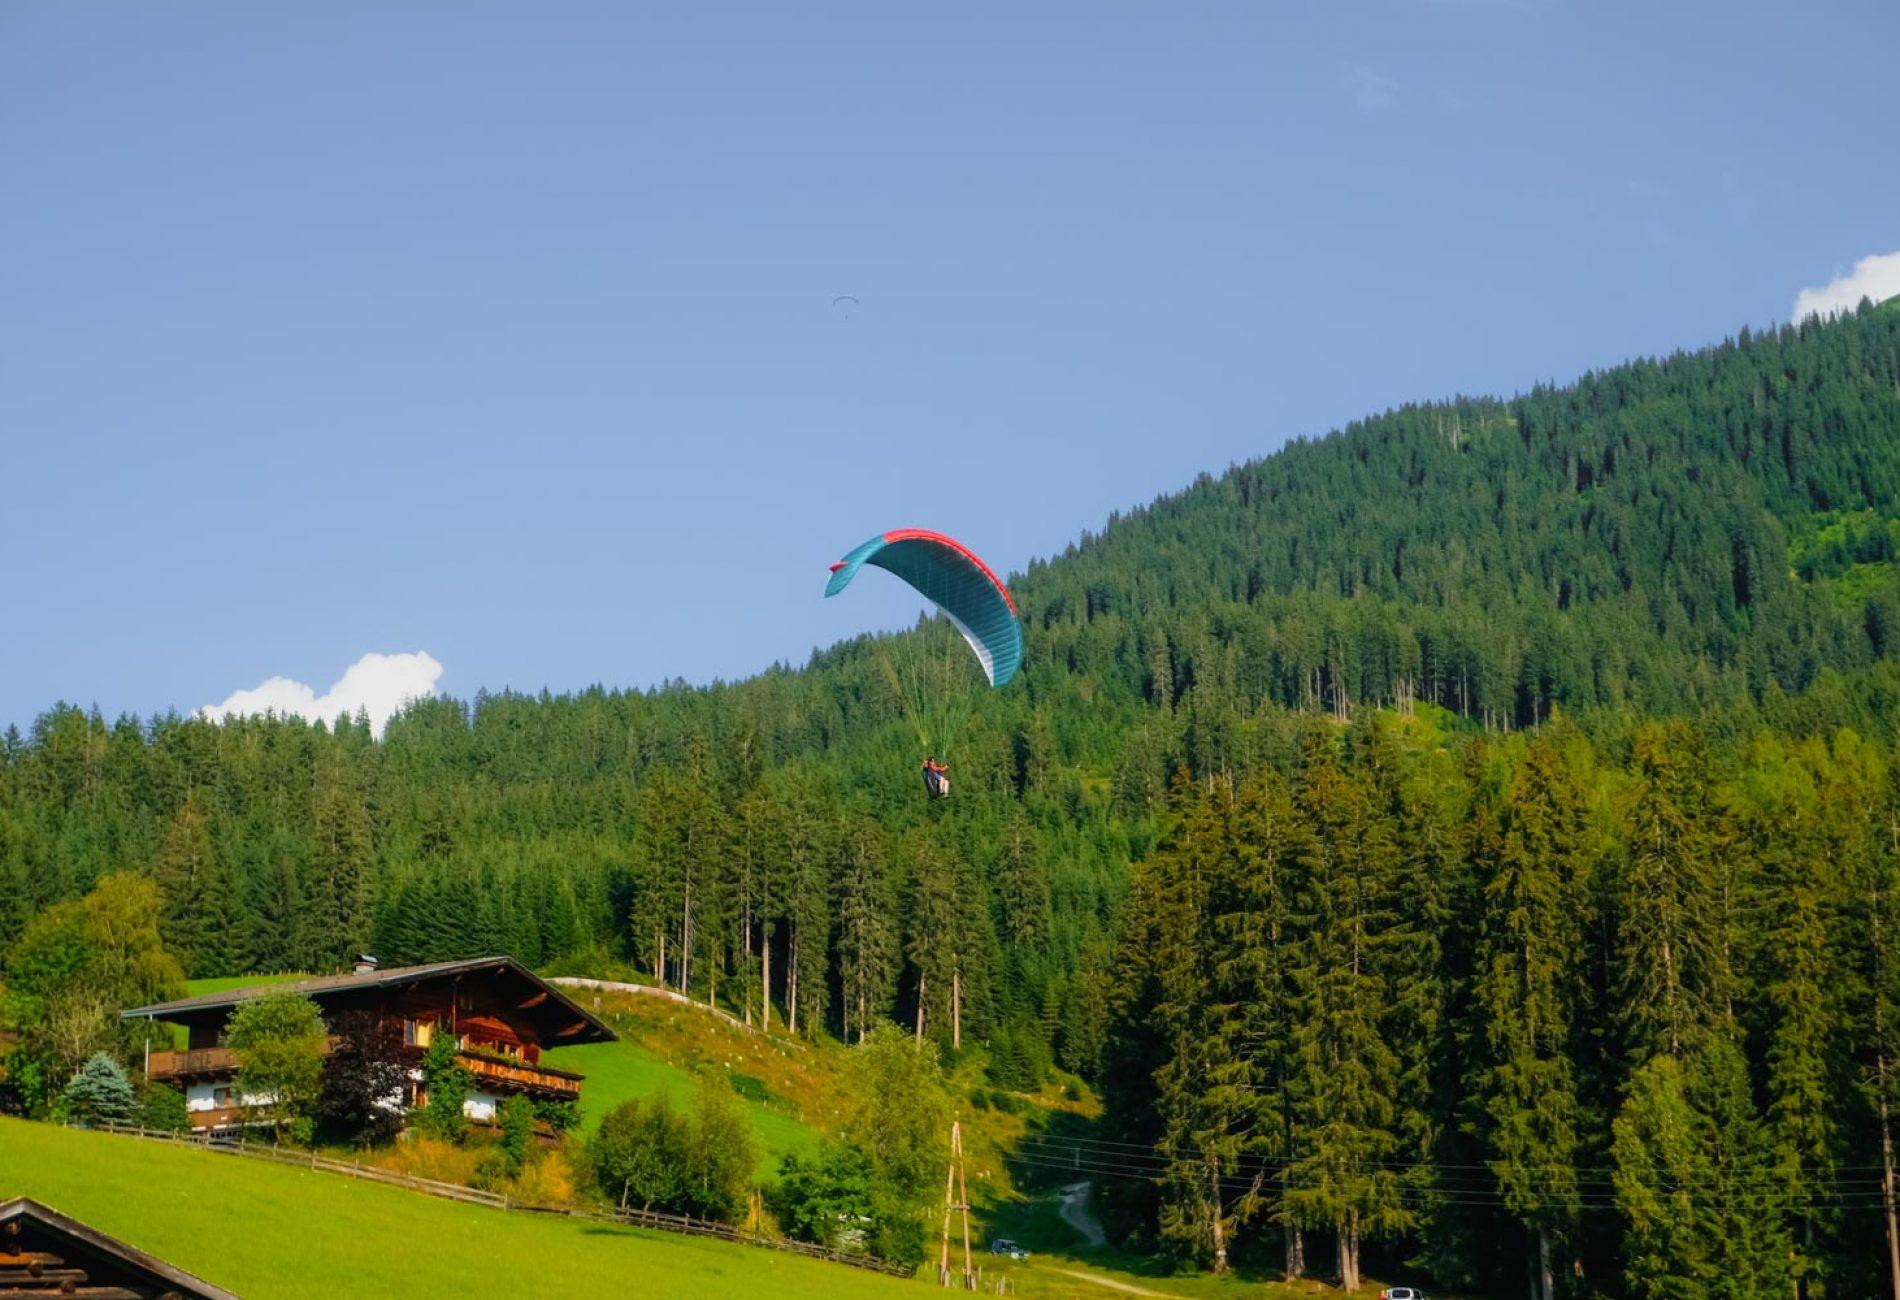 Flugtechnik Training (3) 22.-25.07.2021 mit Adventure Sports